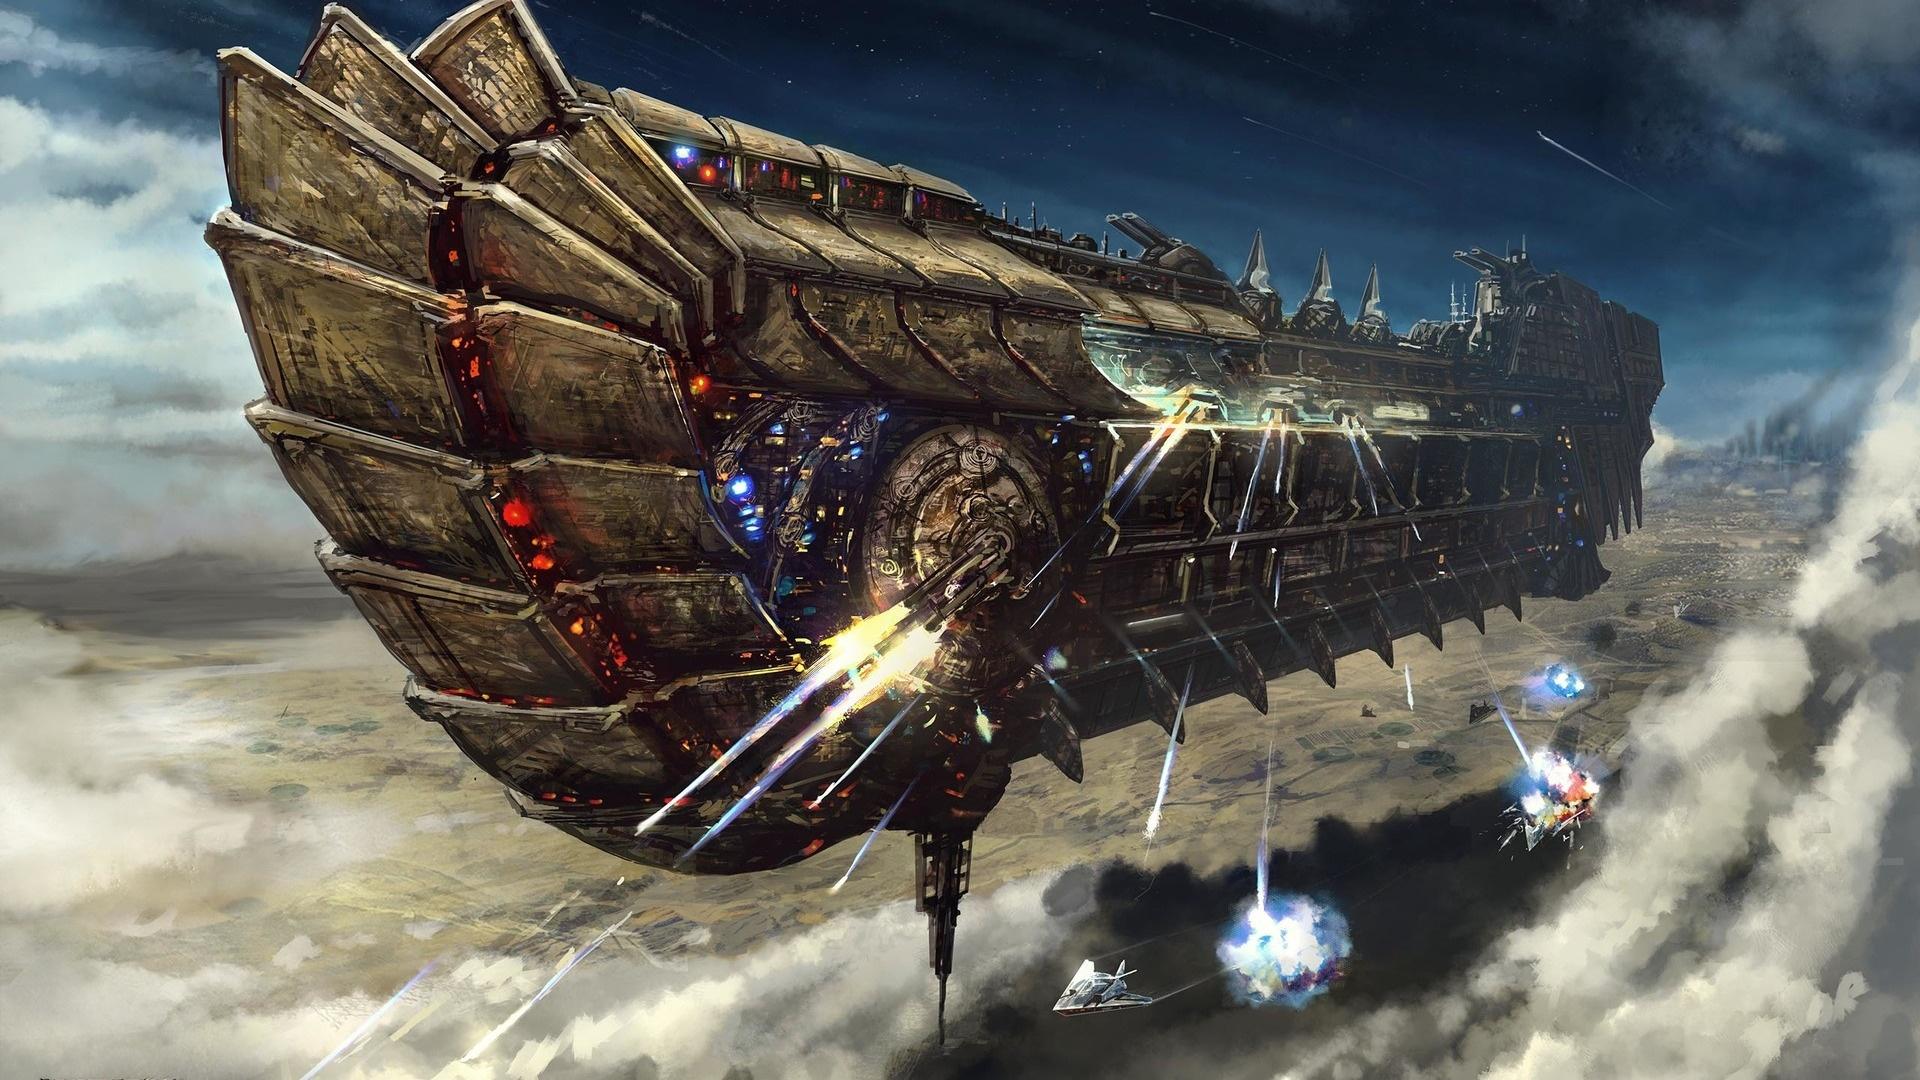 Spaceships Art Wallpaper